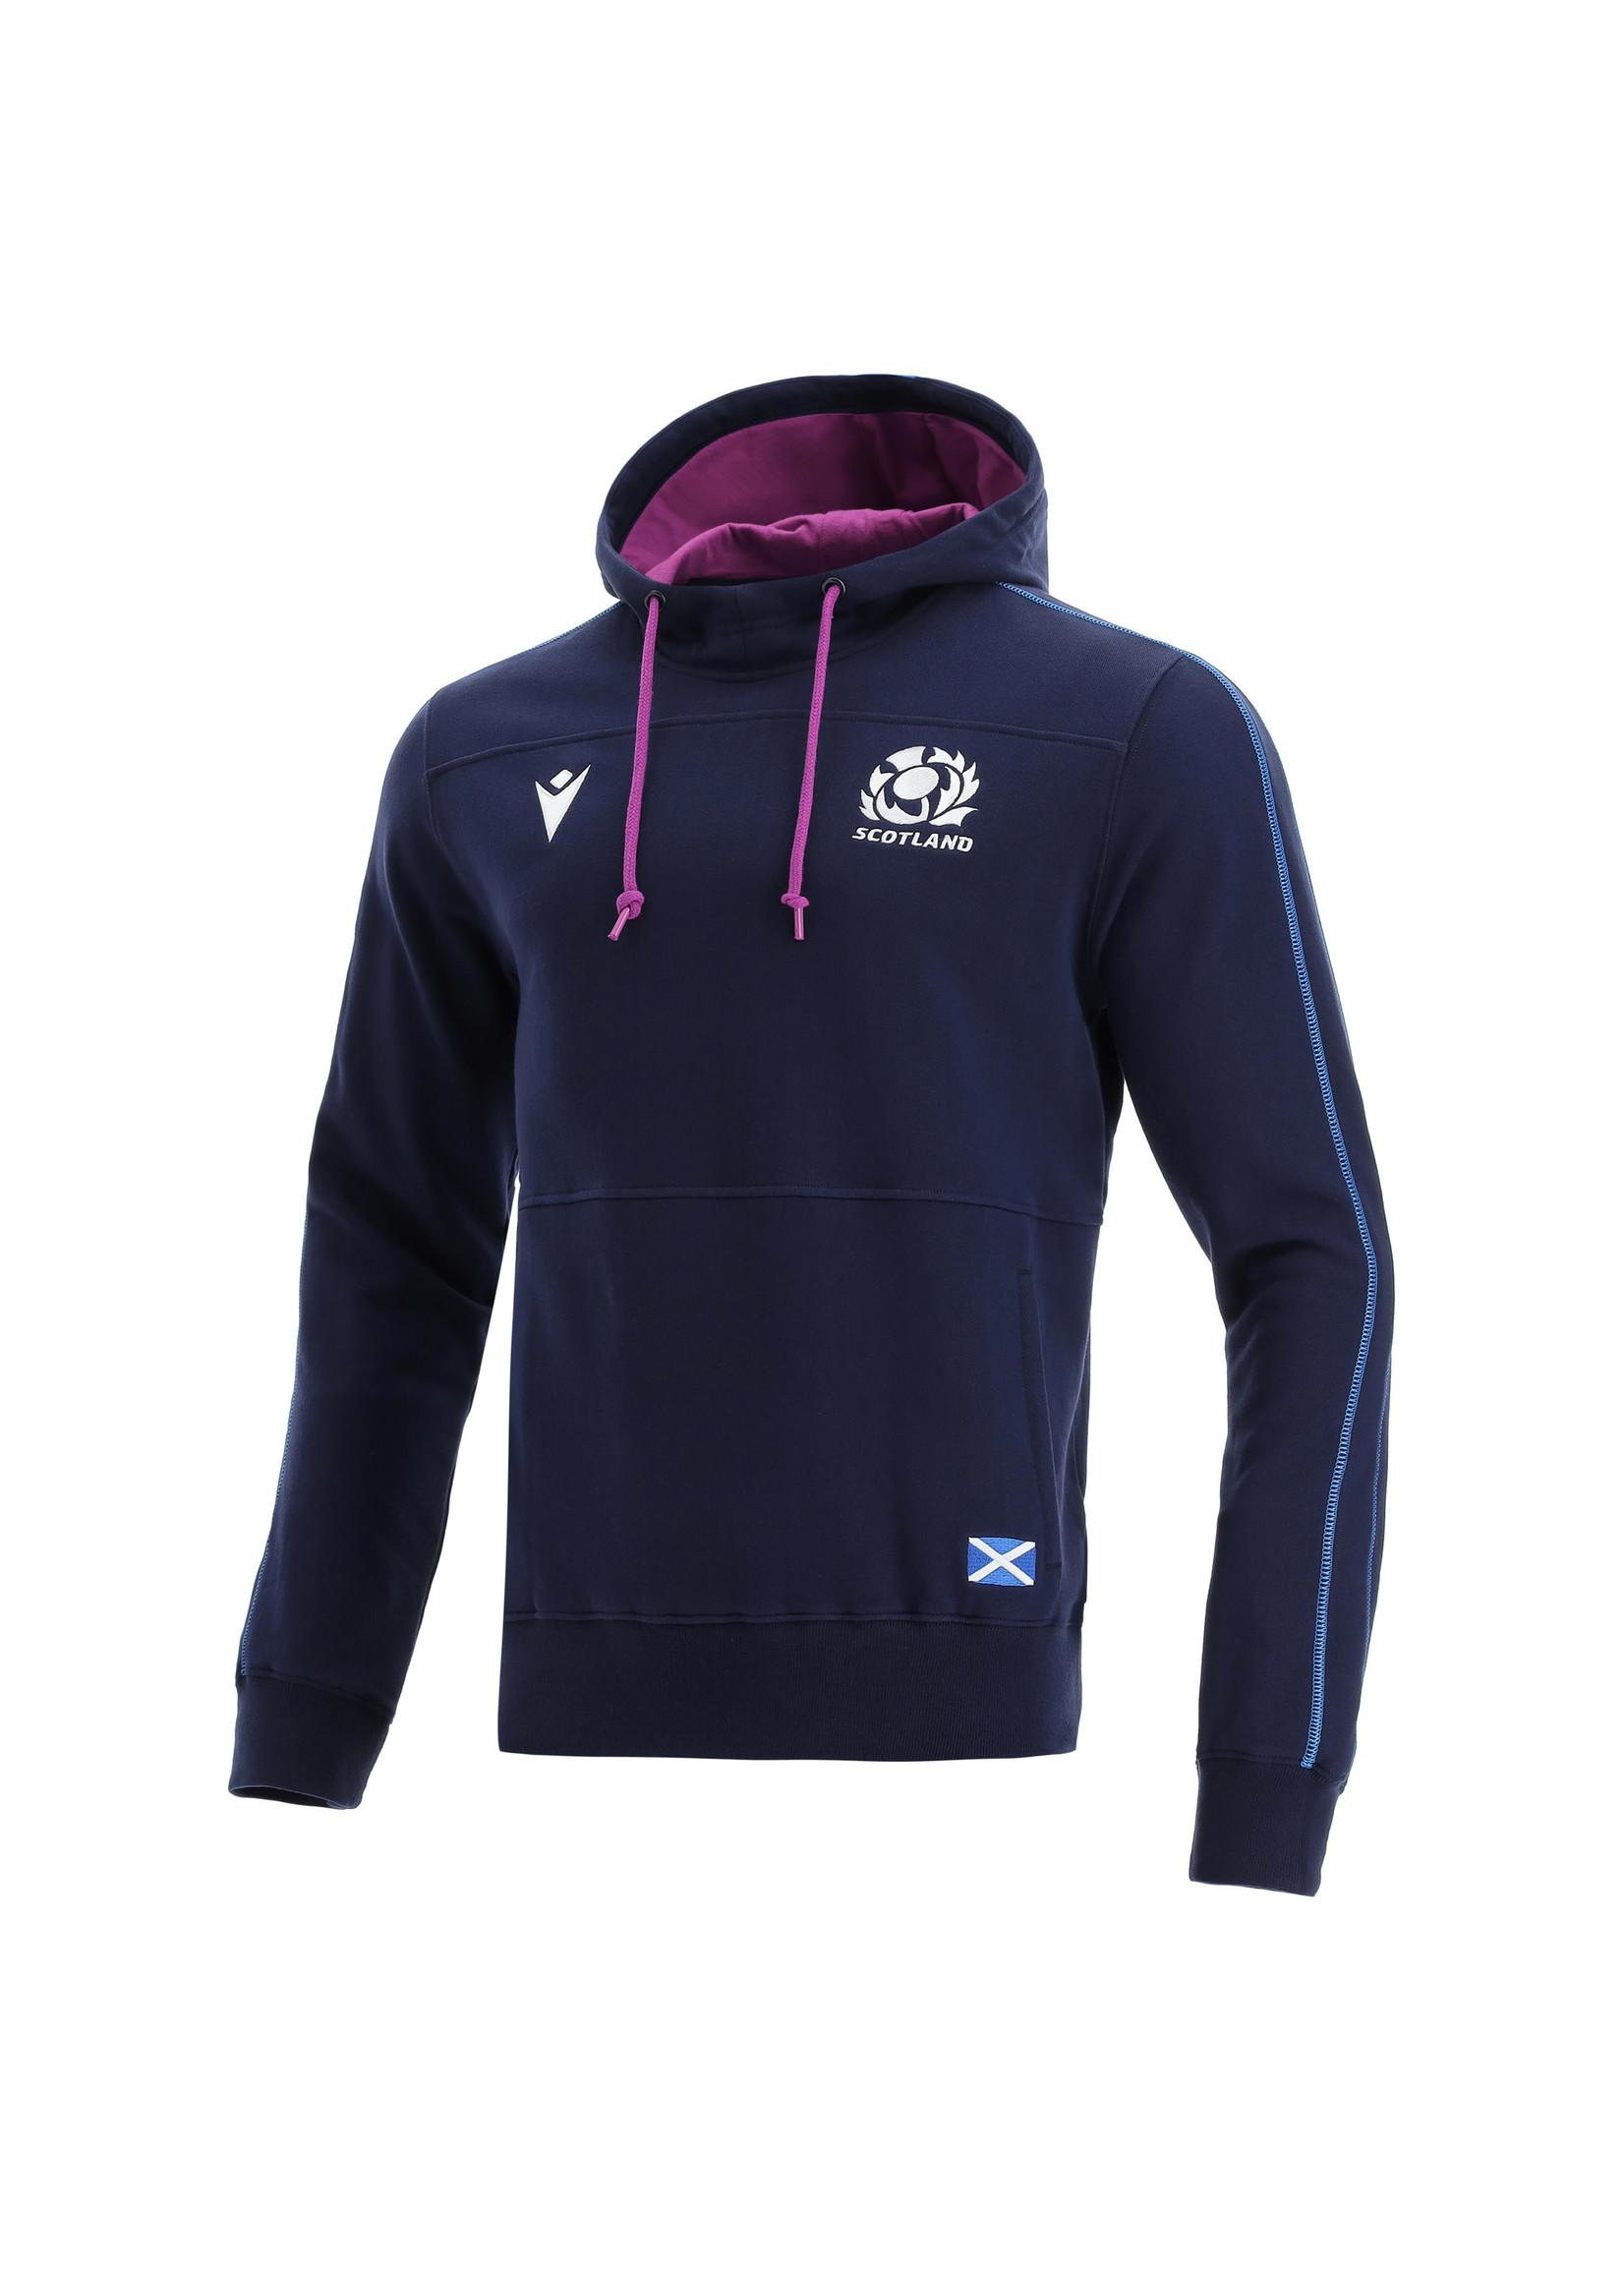 Macron Macron Scotland Rugby - Heavy Cotton Hoody (2021/22) - Navy